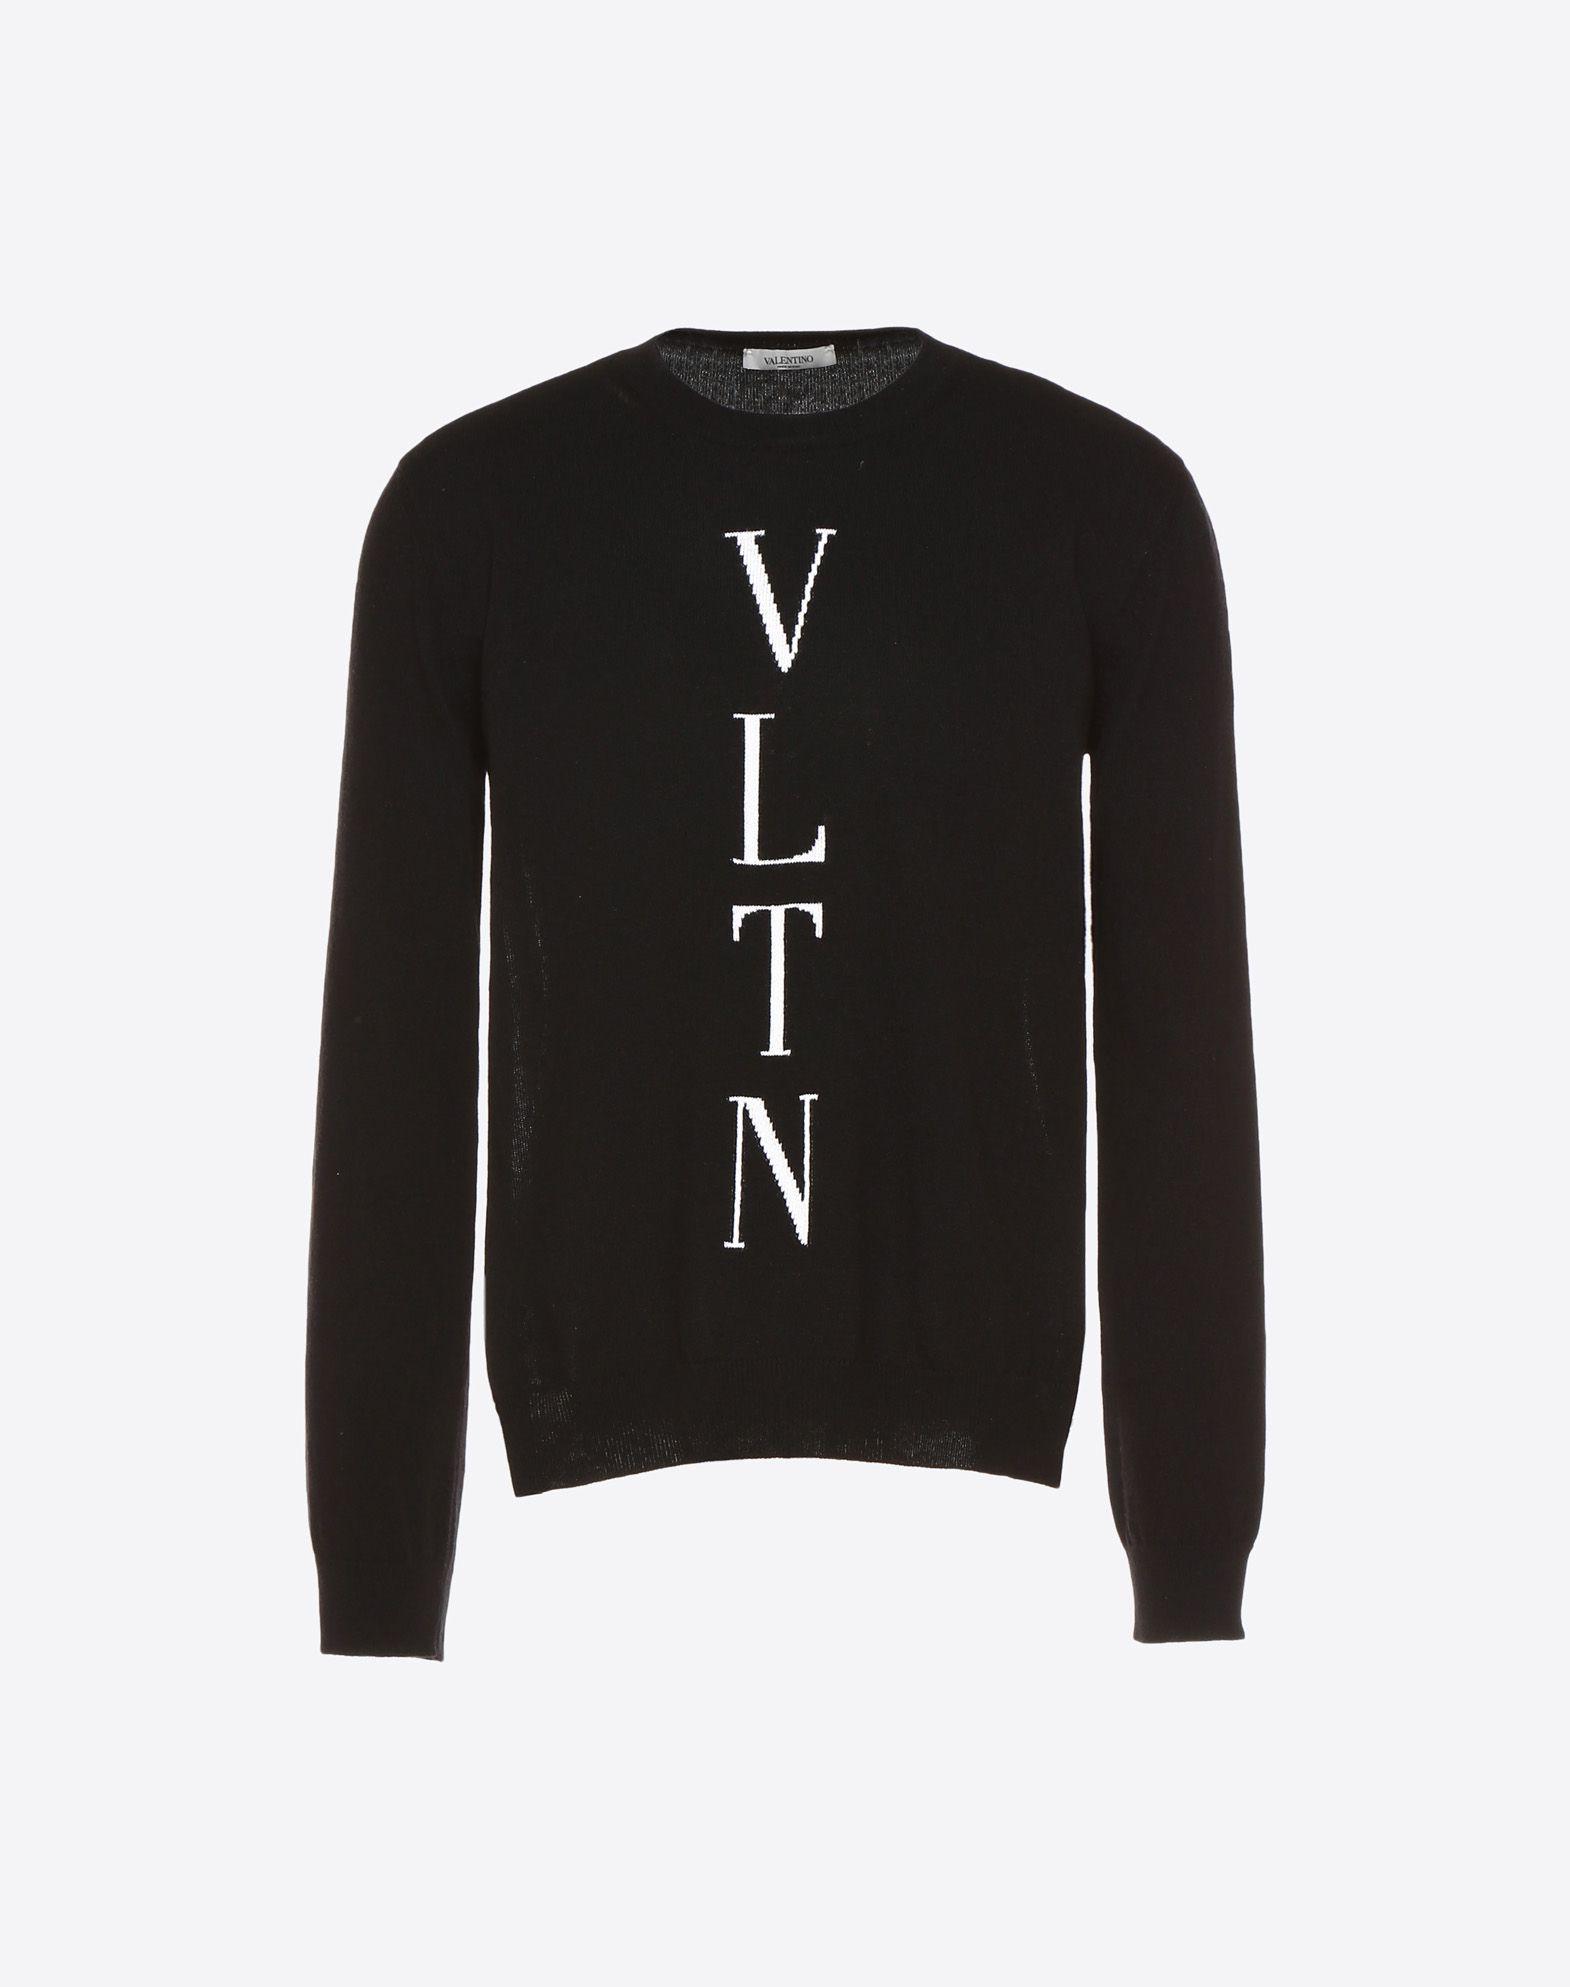 VALENTINO Logo Round collar Long sleeves Side slit hemline Lightweight knitted  49351369kg